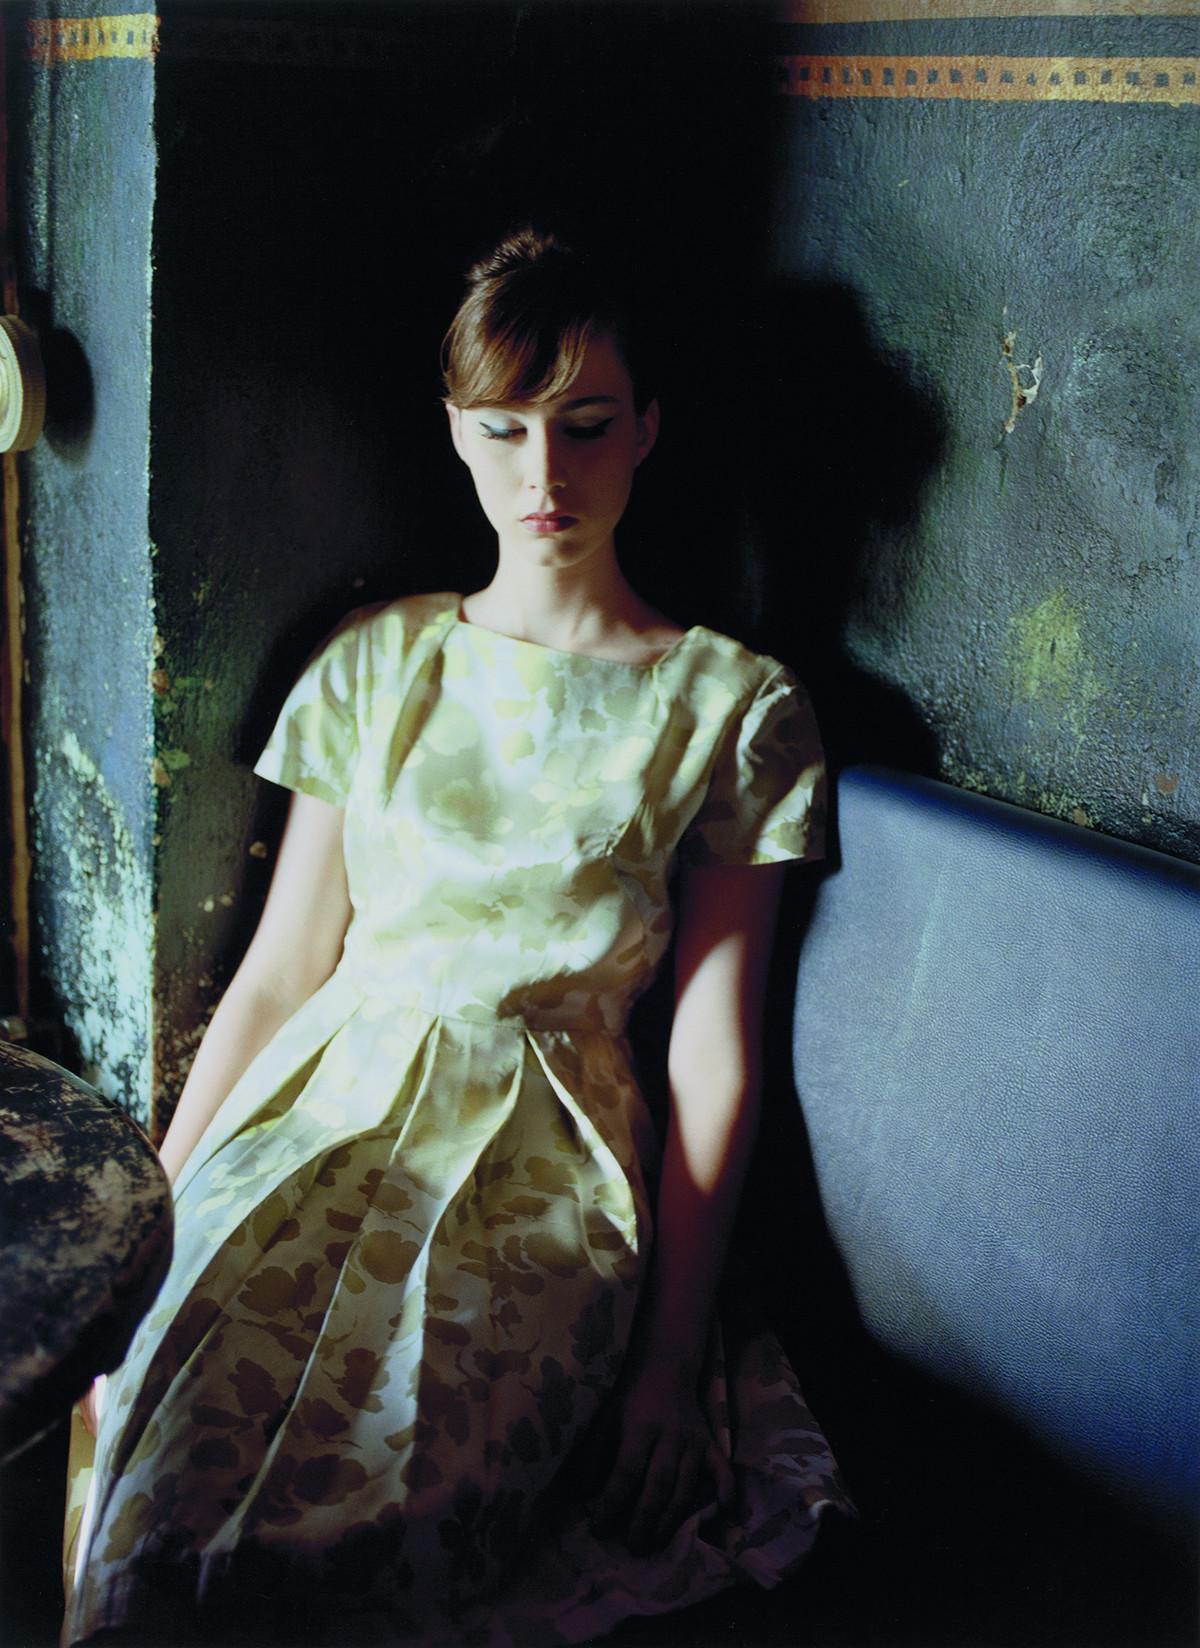 Sibylle Bergemann, Lily, Berlin, 2009, courtesy Loock Galerie ©Nachlass Sibylle Bergemann; Ostkreuz